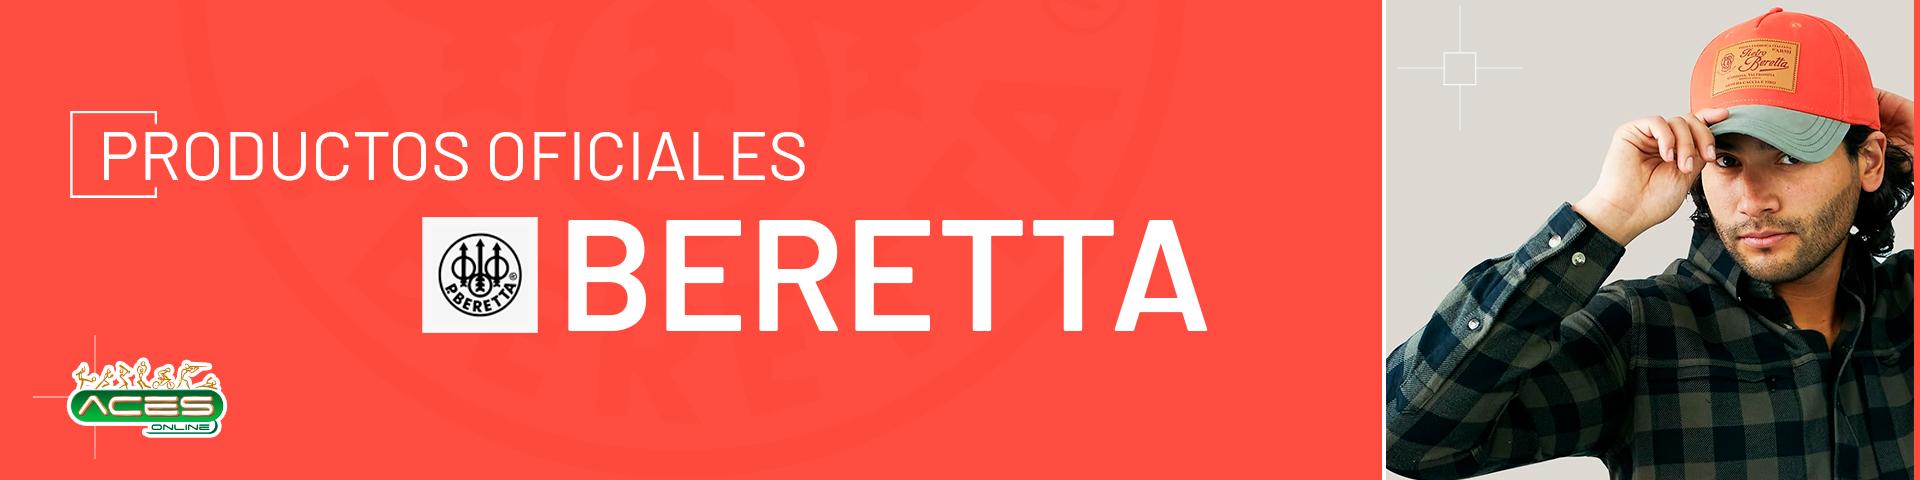 productos_beretta_aces_online_2